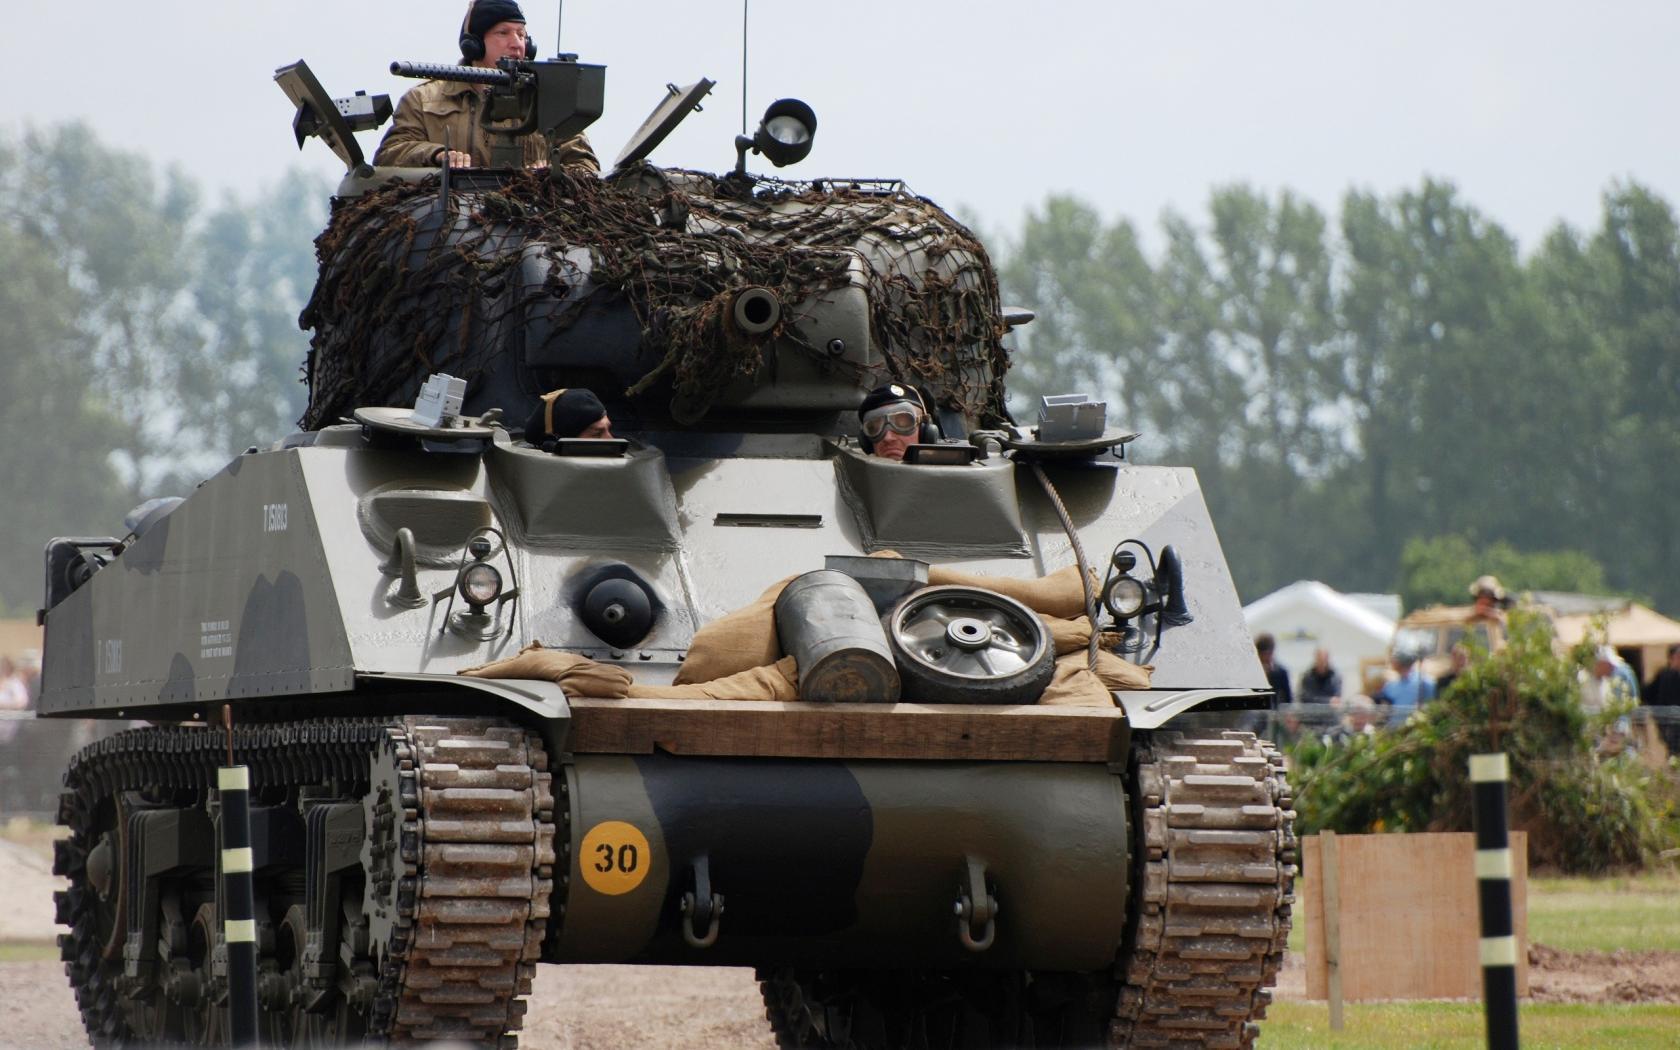 army_military_sherman_weaponry_sharman_1680x1050_27447